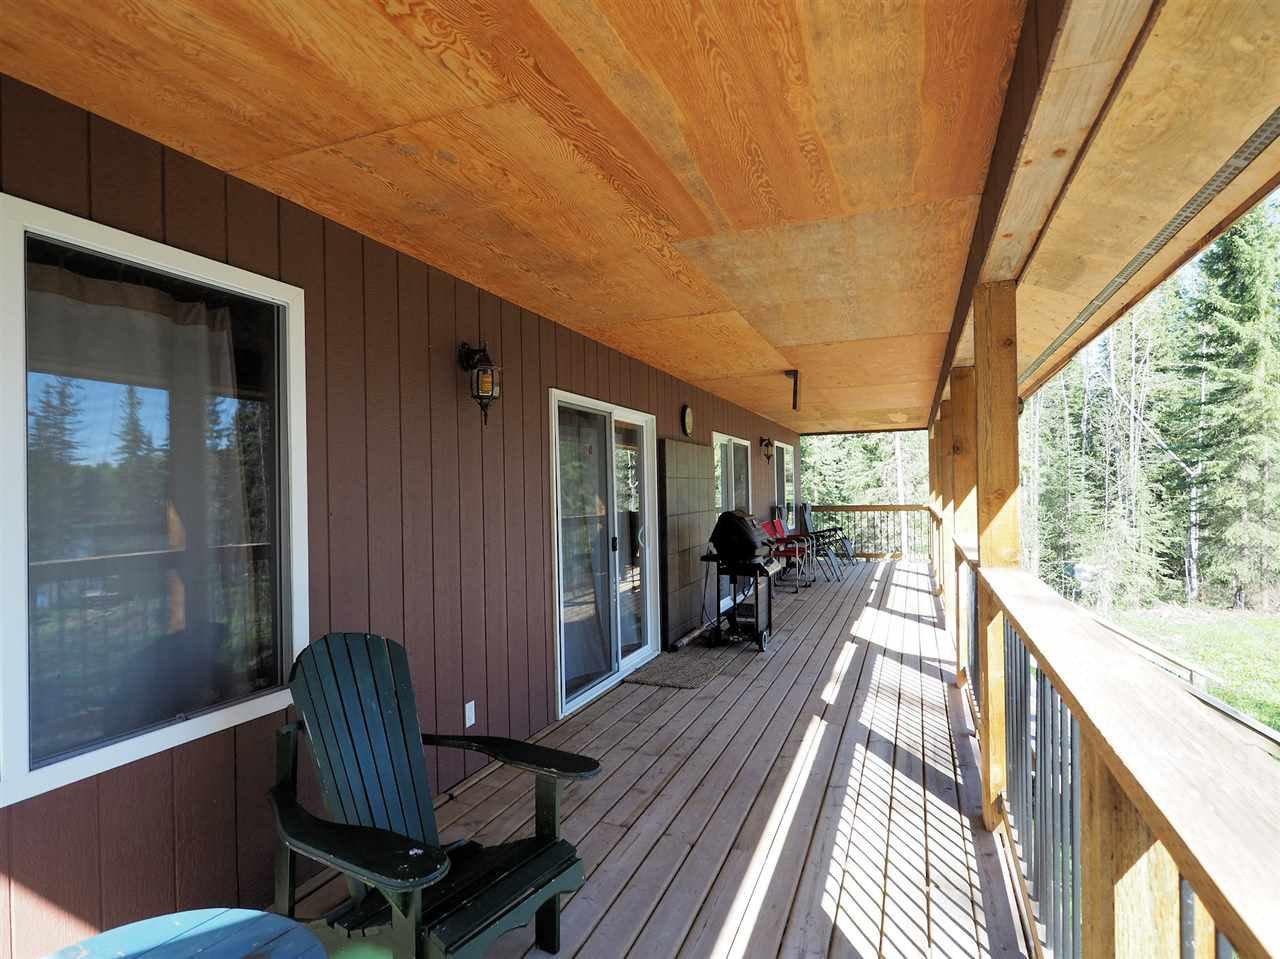 Photo 30: Photos: 8222 CENTENNIAL Road in Bridge Lake: Bridge Lake/Sheridan Lake House for sale (100 Mile House (Zone 10))  : MLS®# R2457362